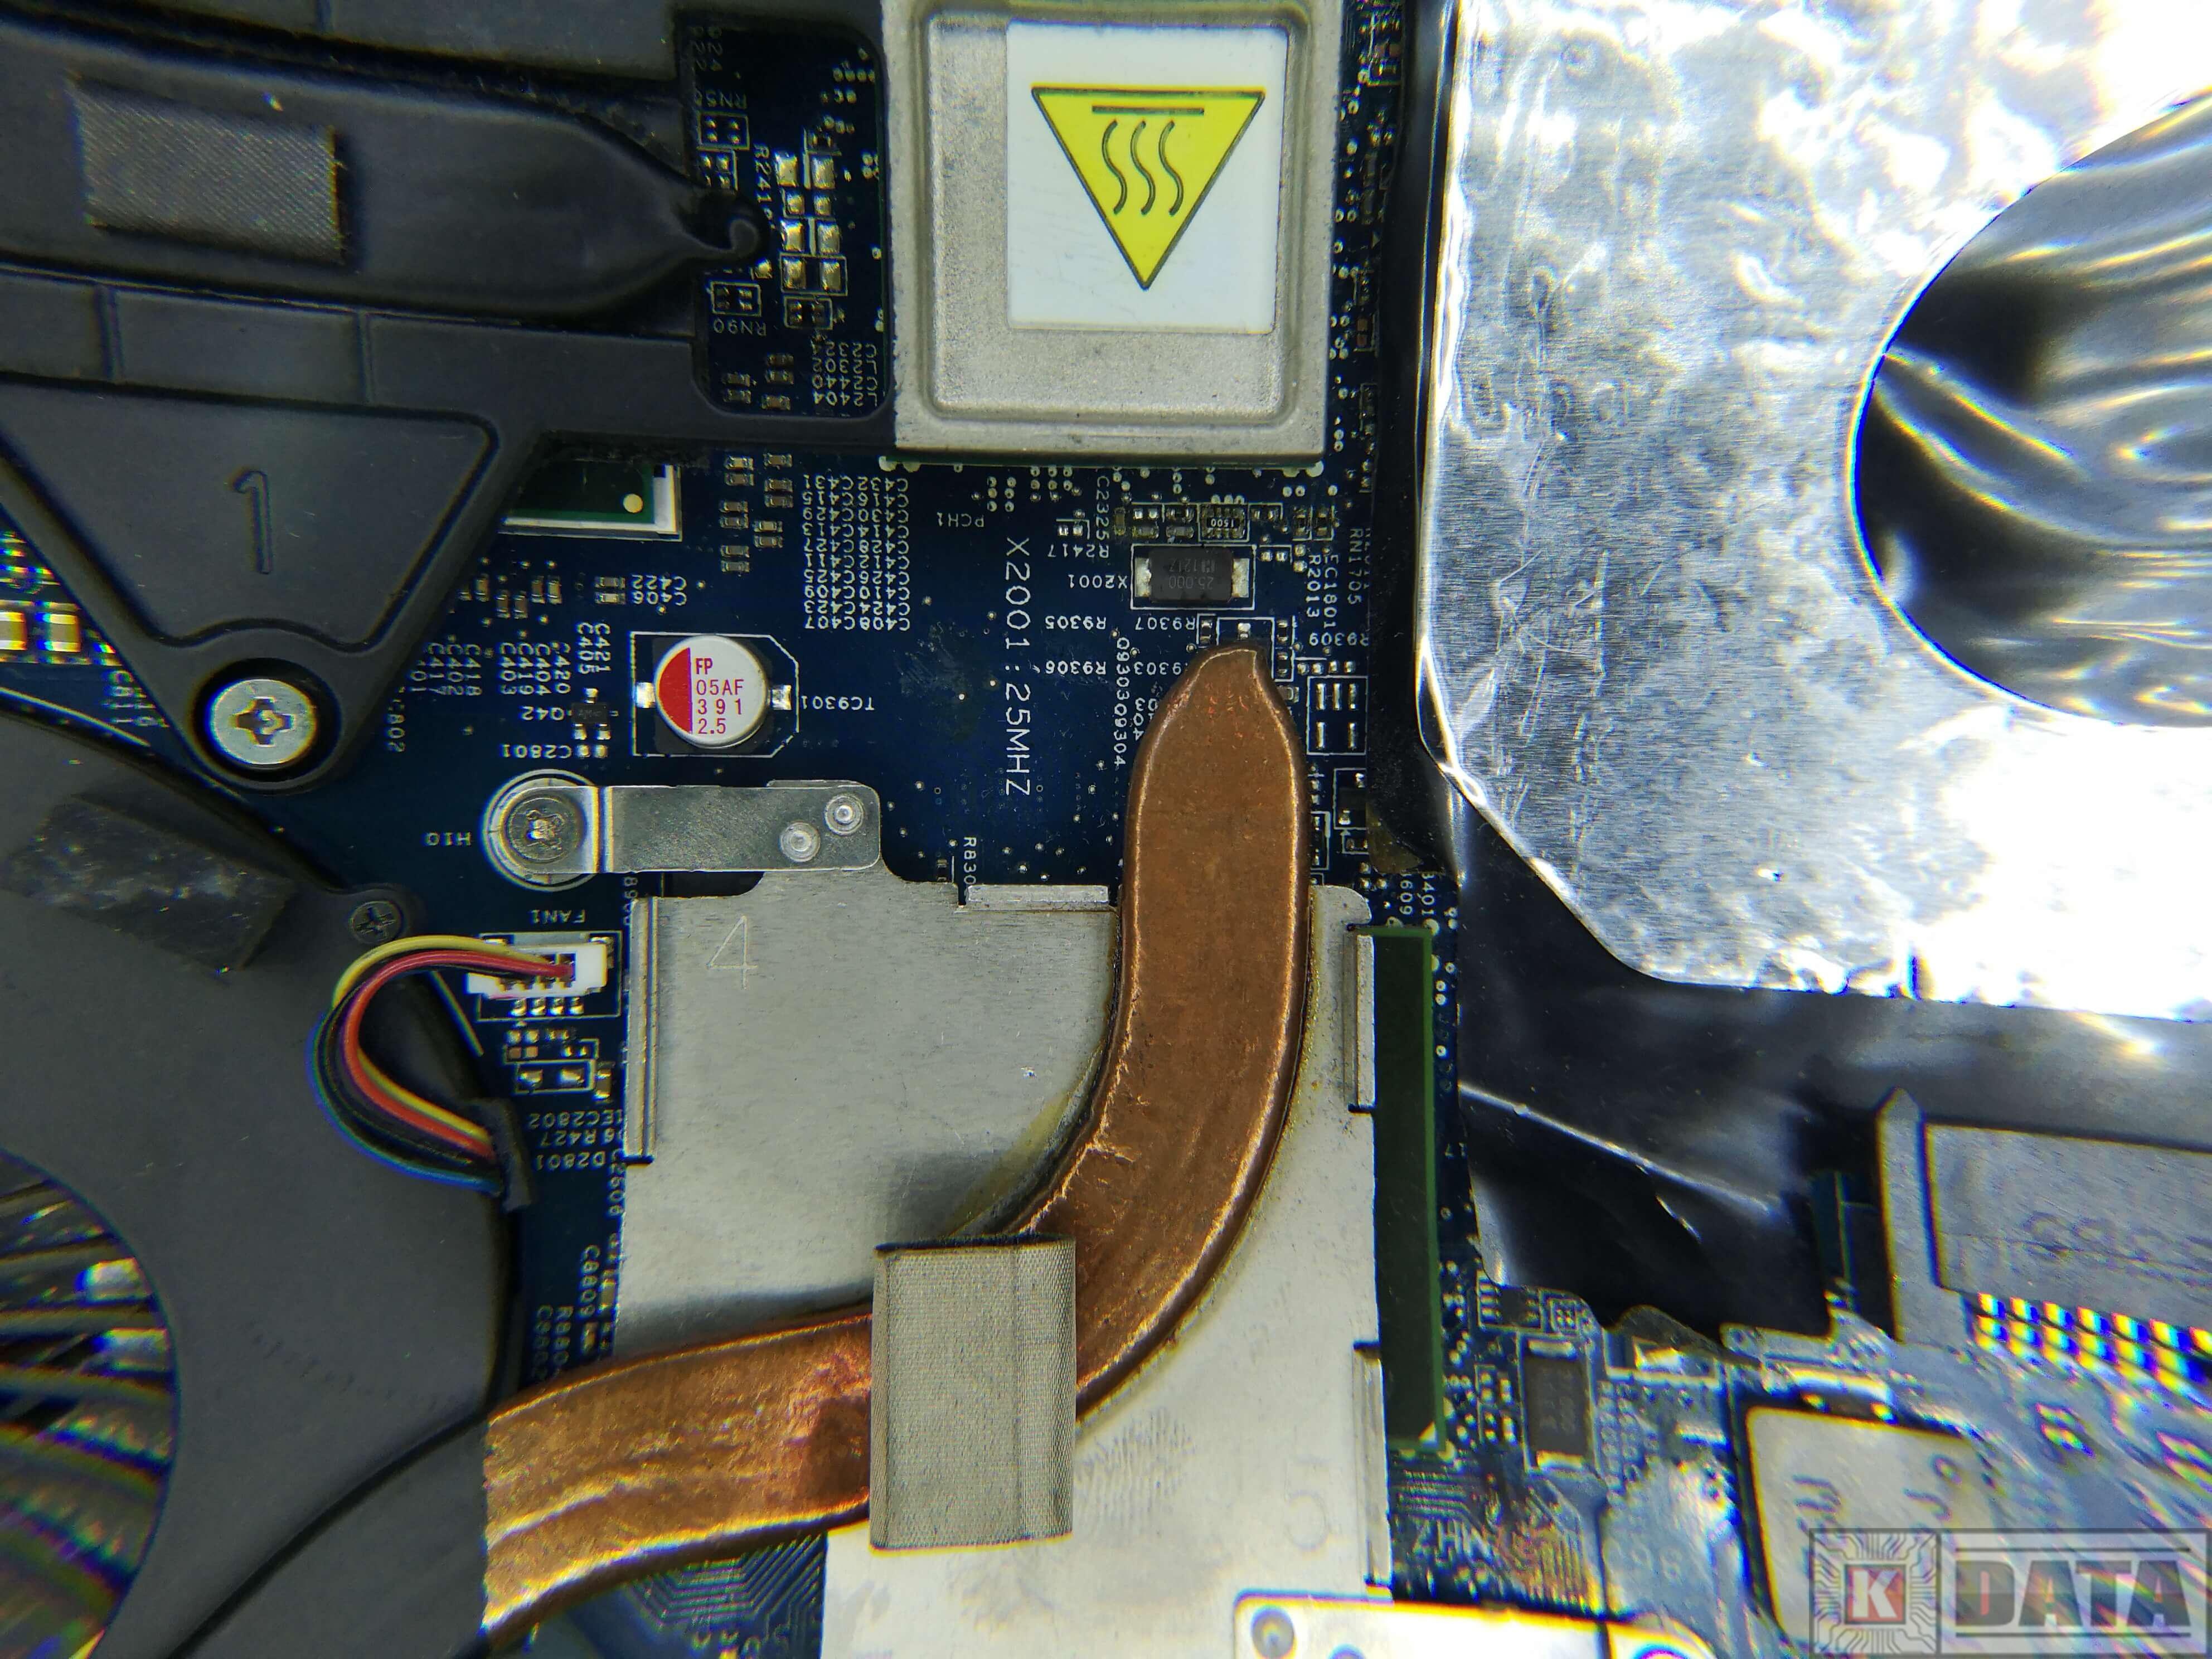 Lenovo IdeaPad Z570 pod lupą 3